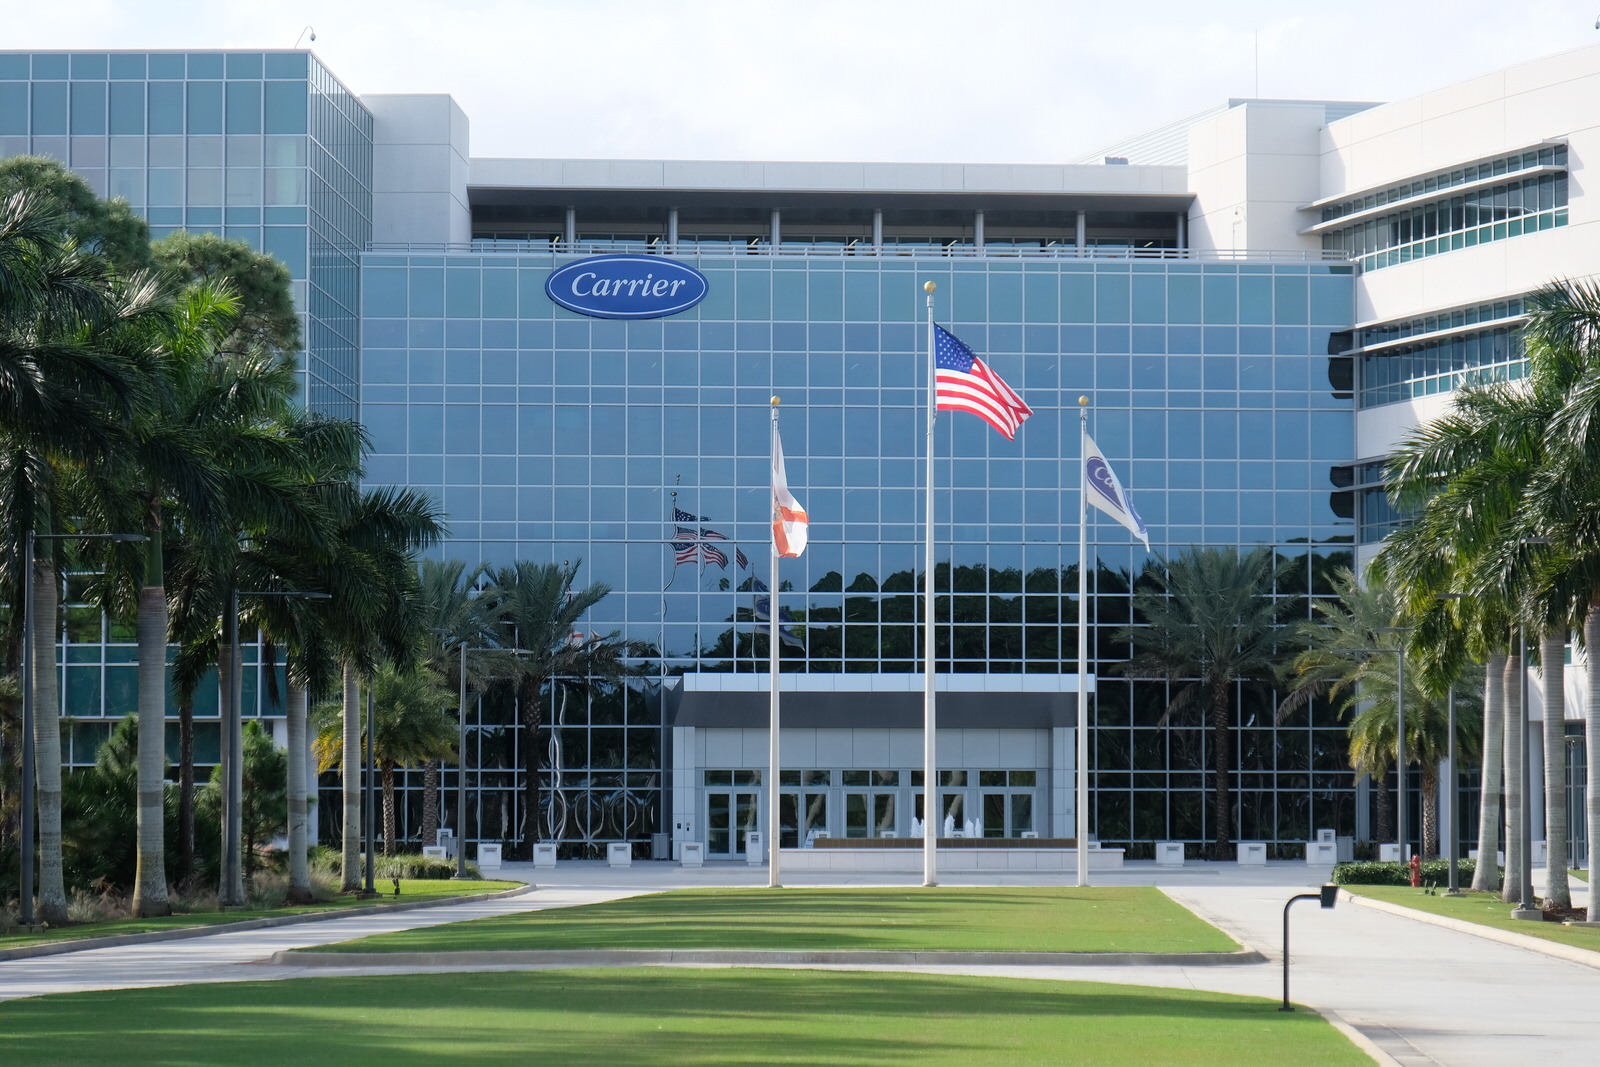 Carrier research center in Jupiter, Florida.